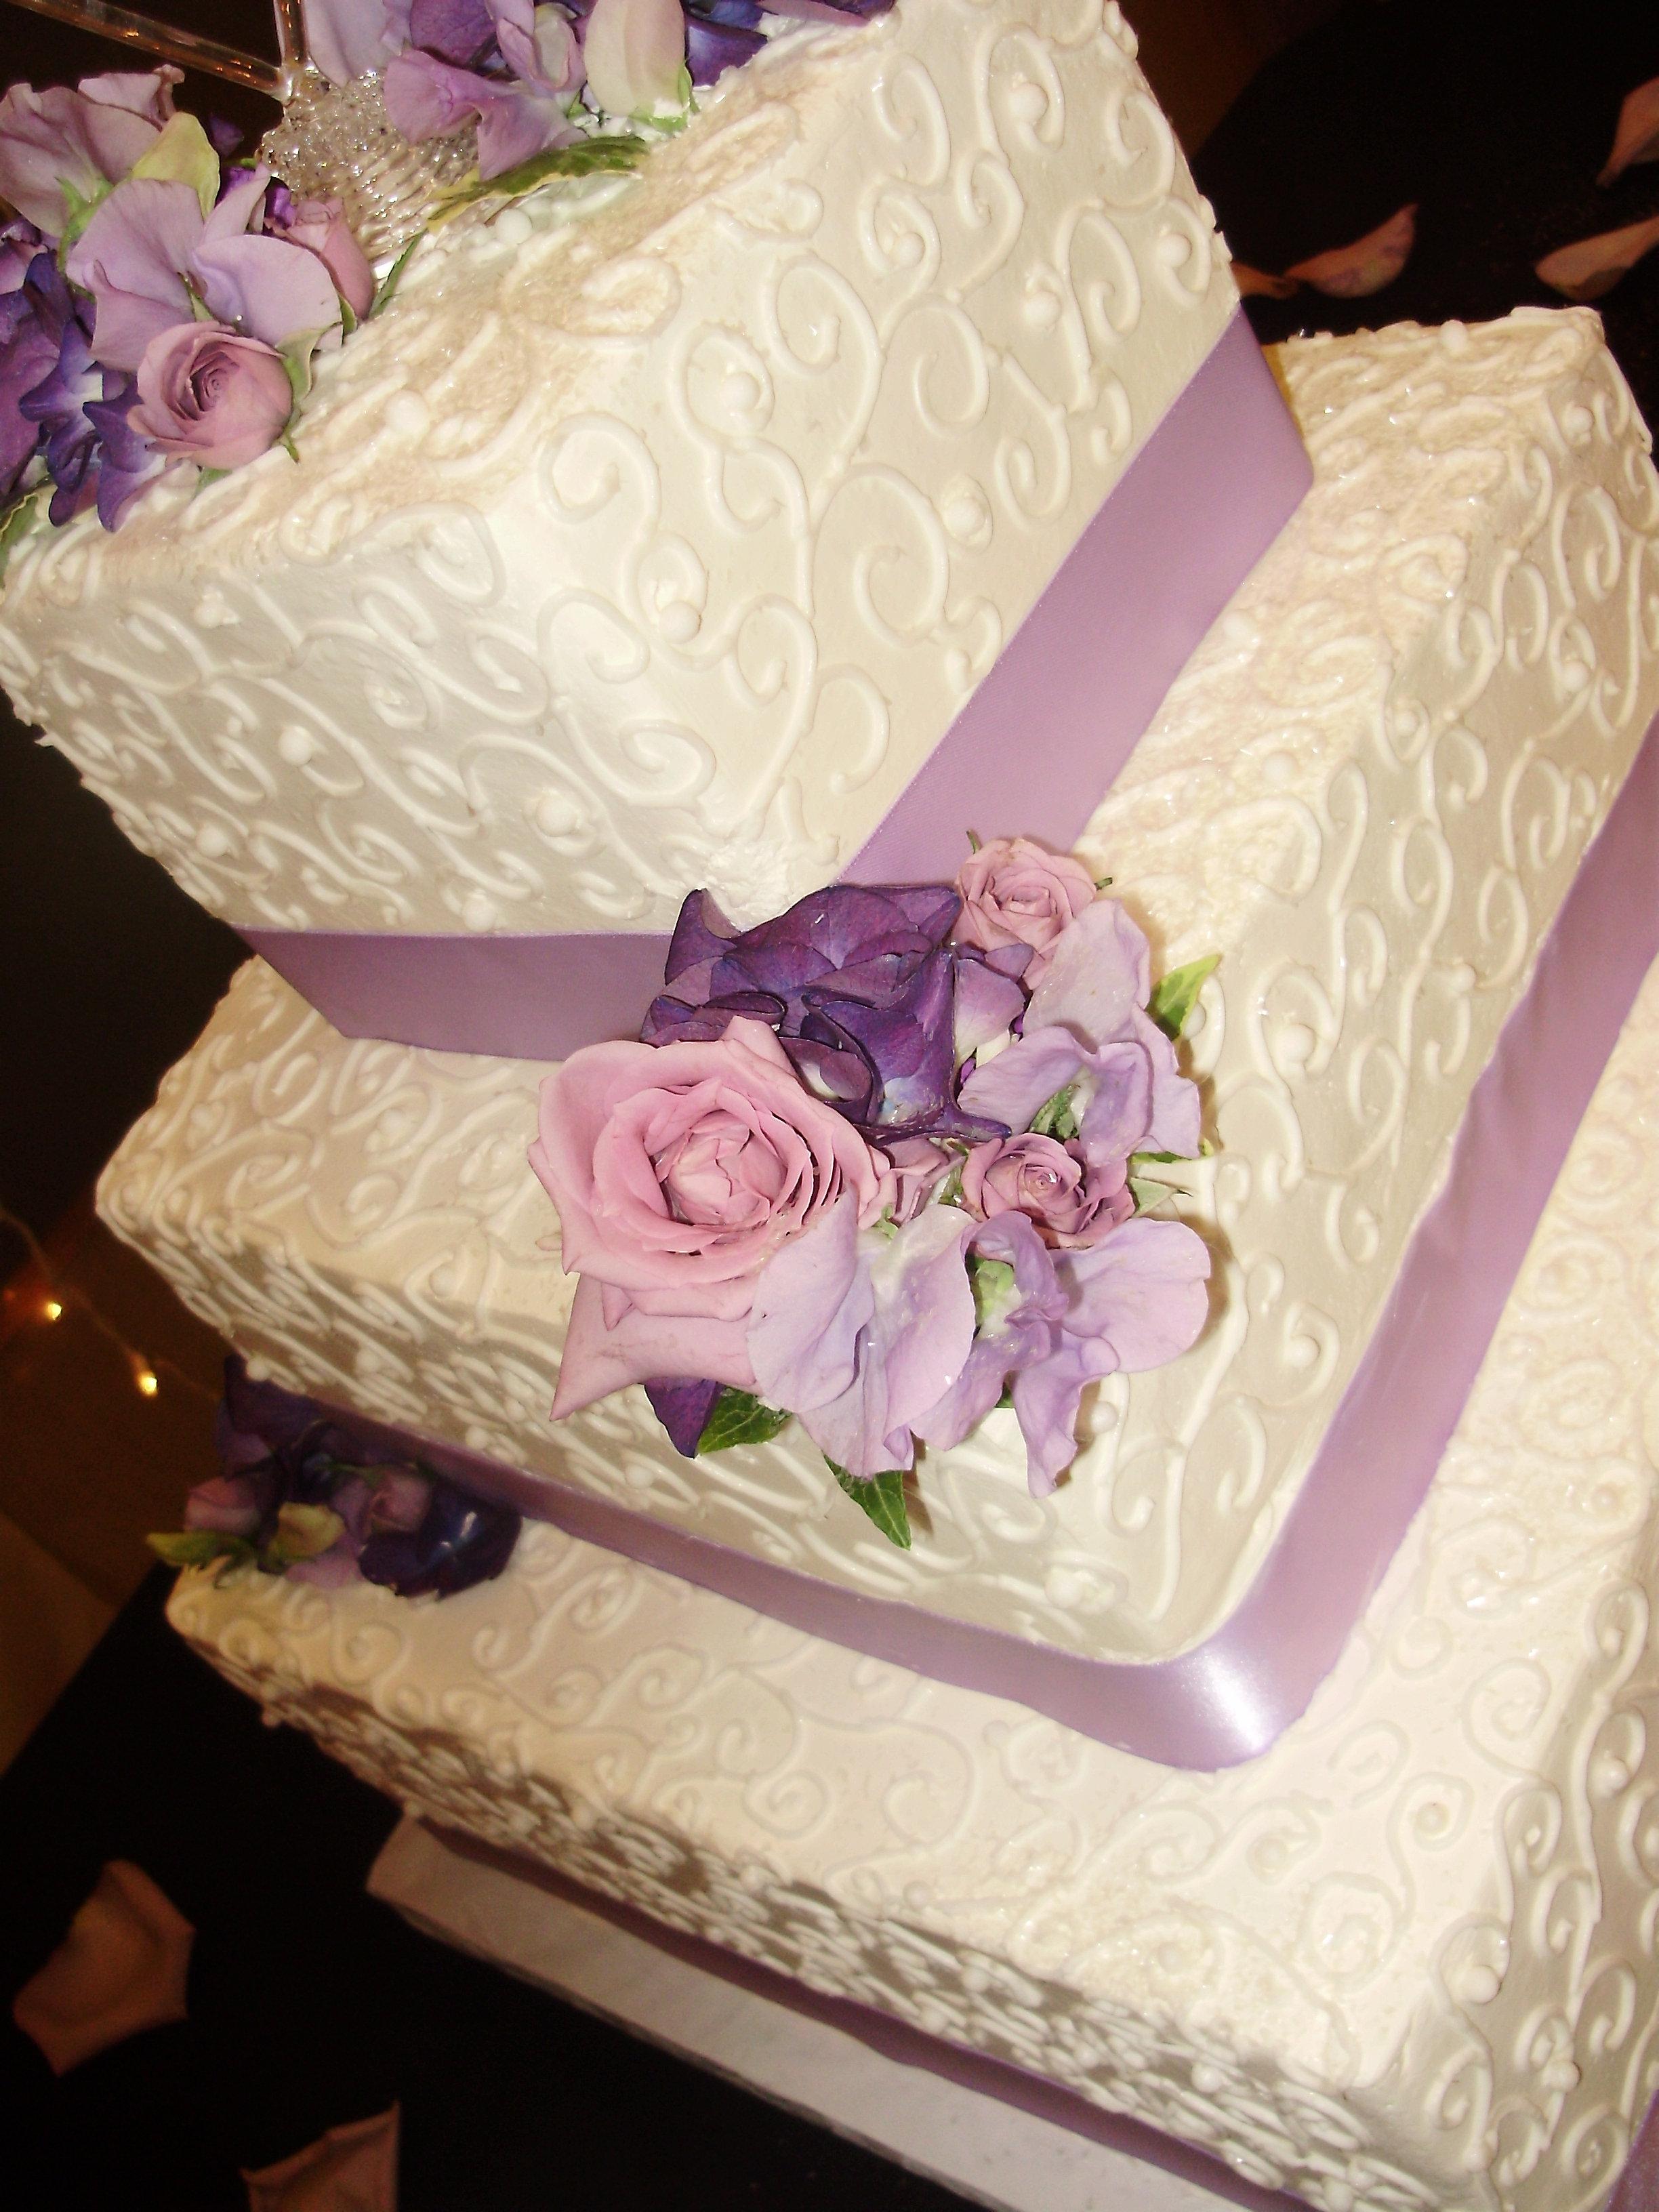 Photo Topper For Square Cake